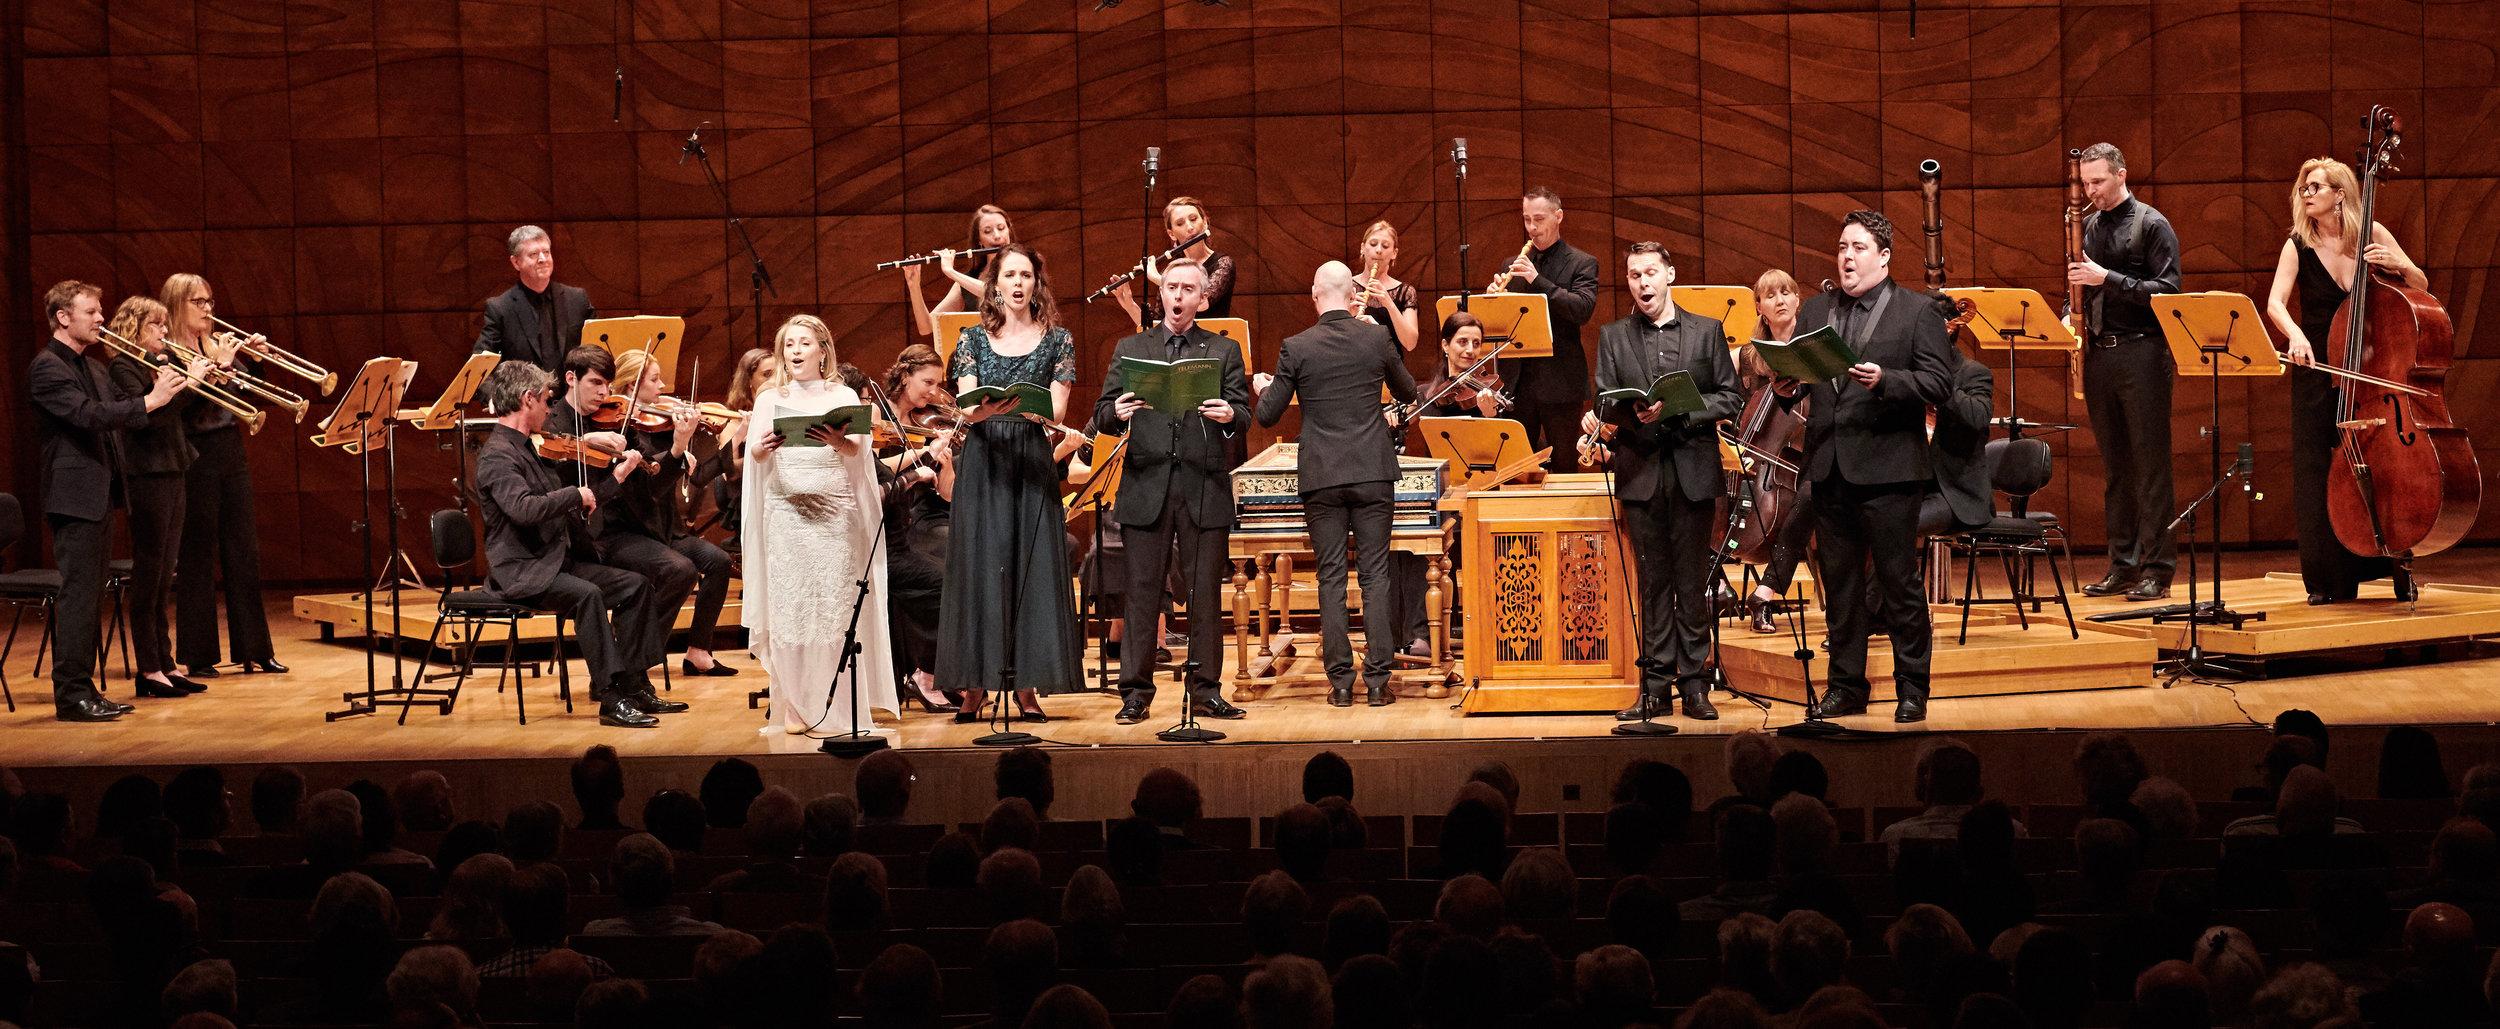 Bach & Telemann - Pincgut Opera / Melbourne & Sydney / April 2019